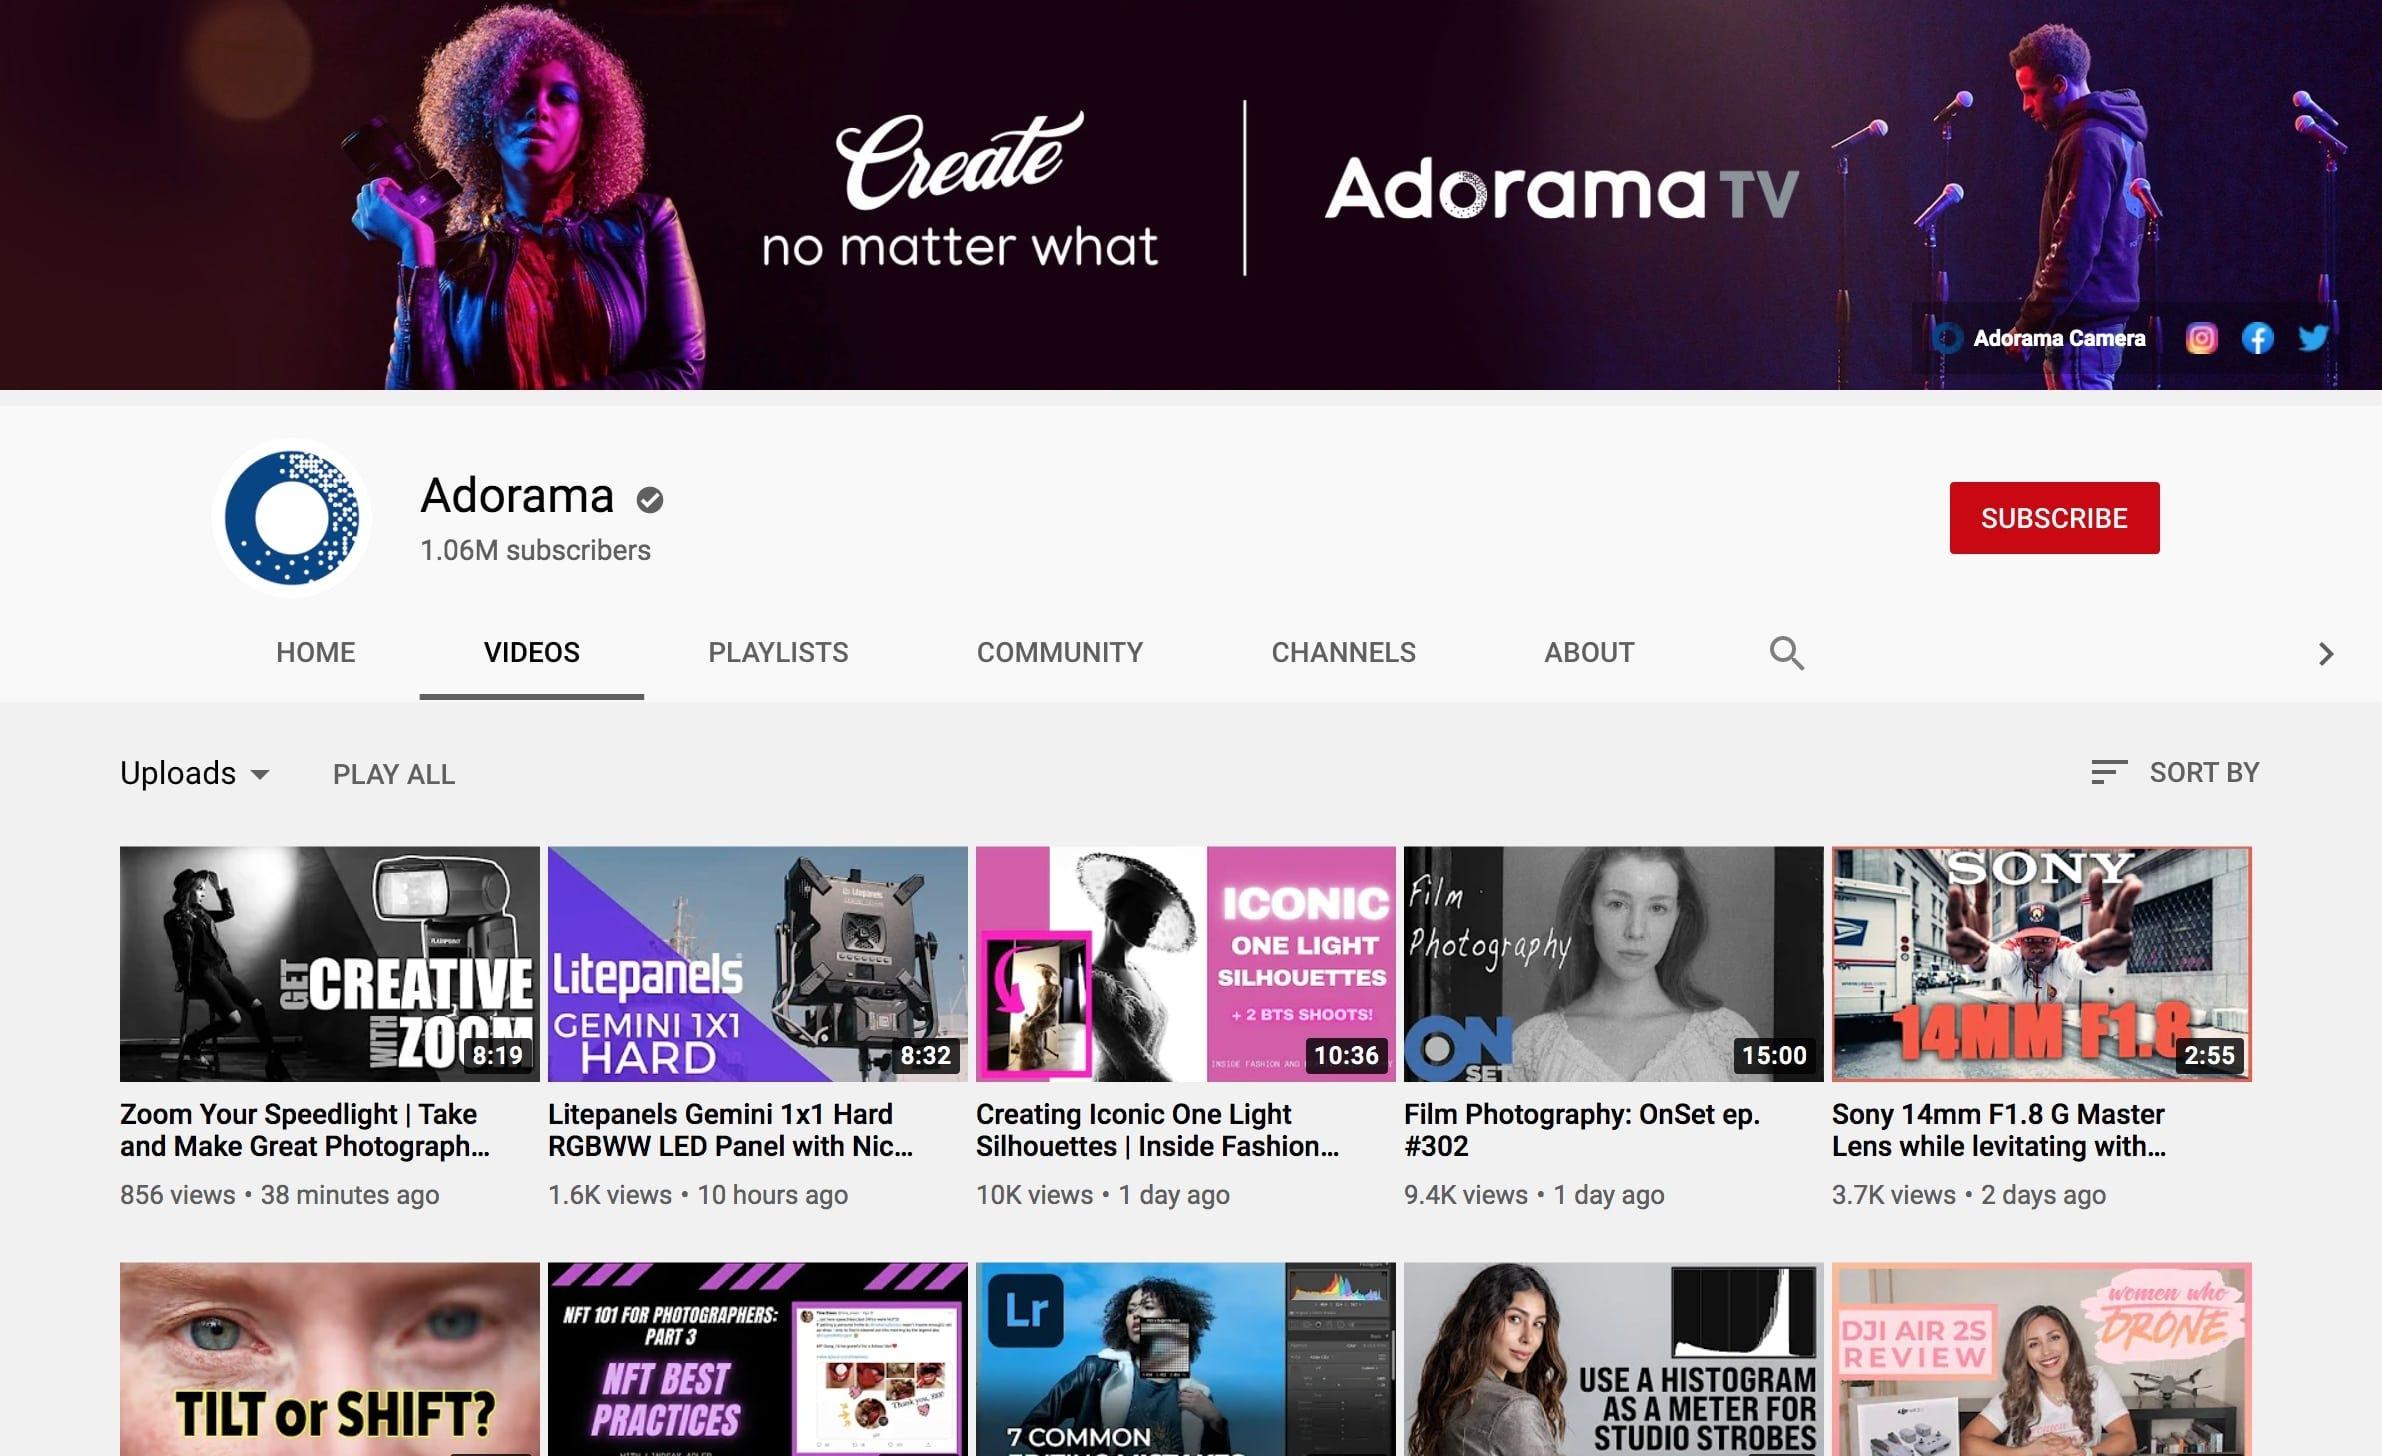 Adorama YouTube channel